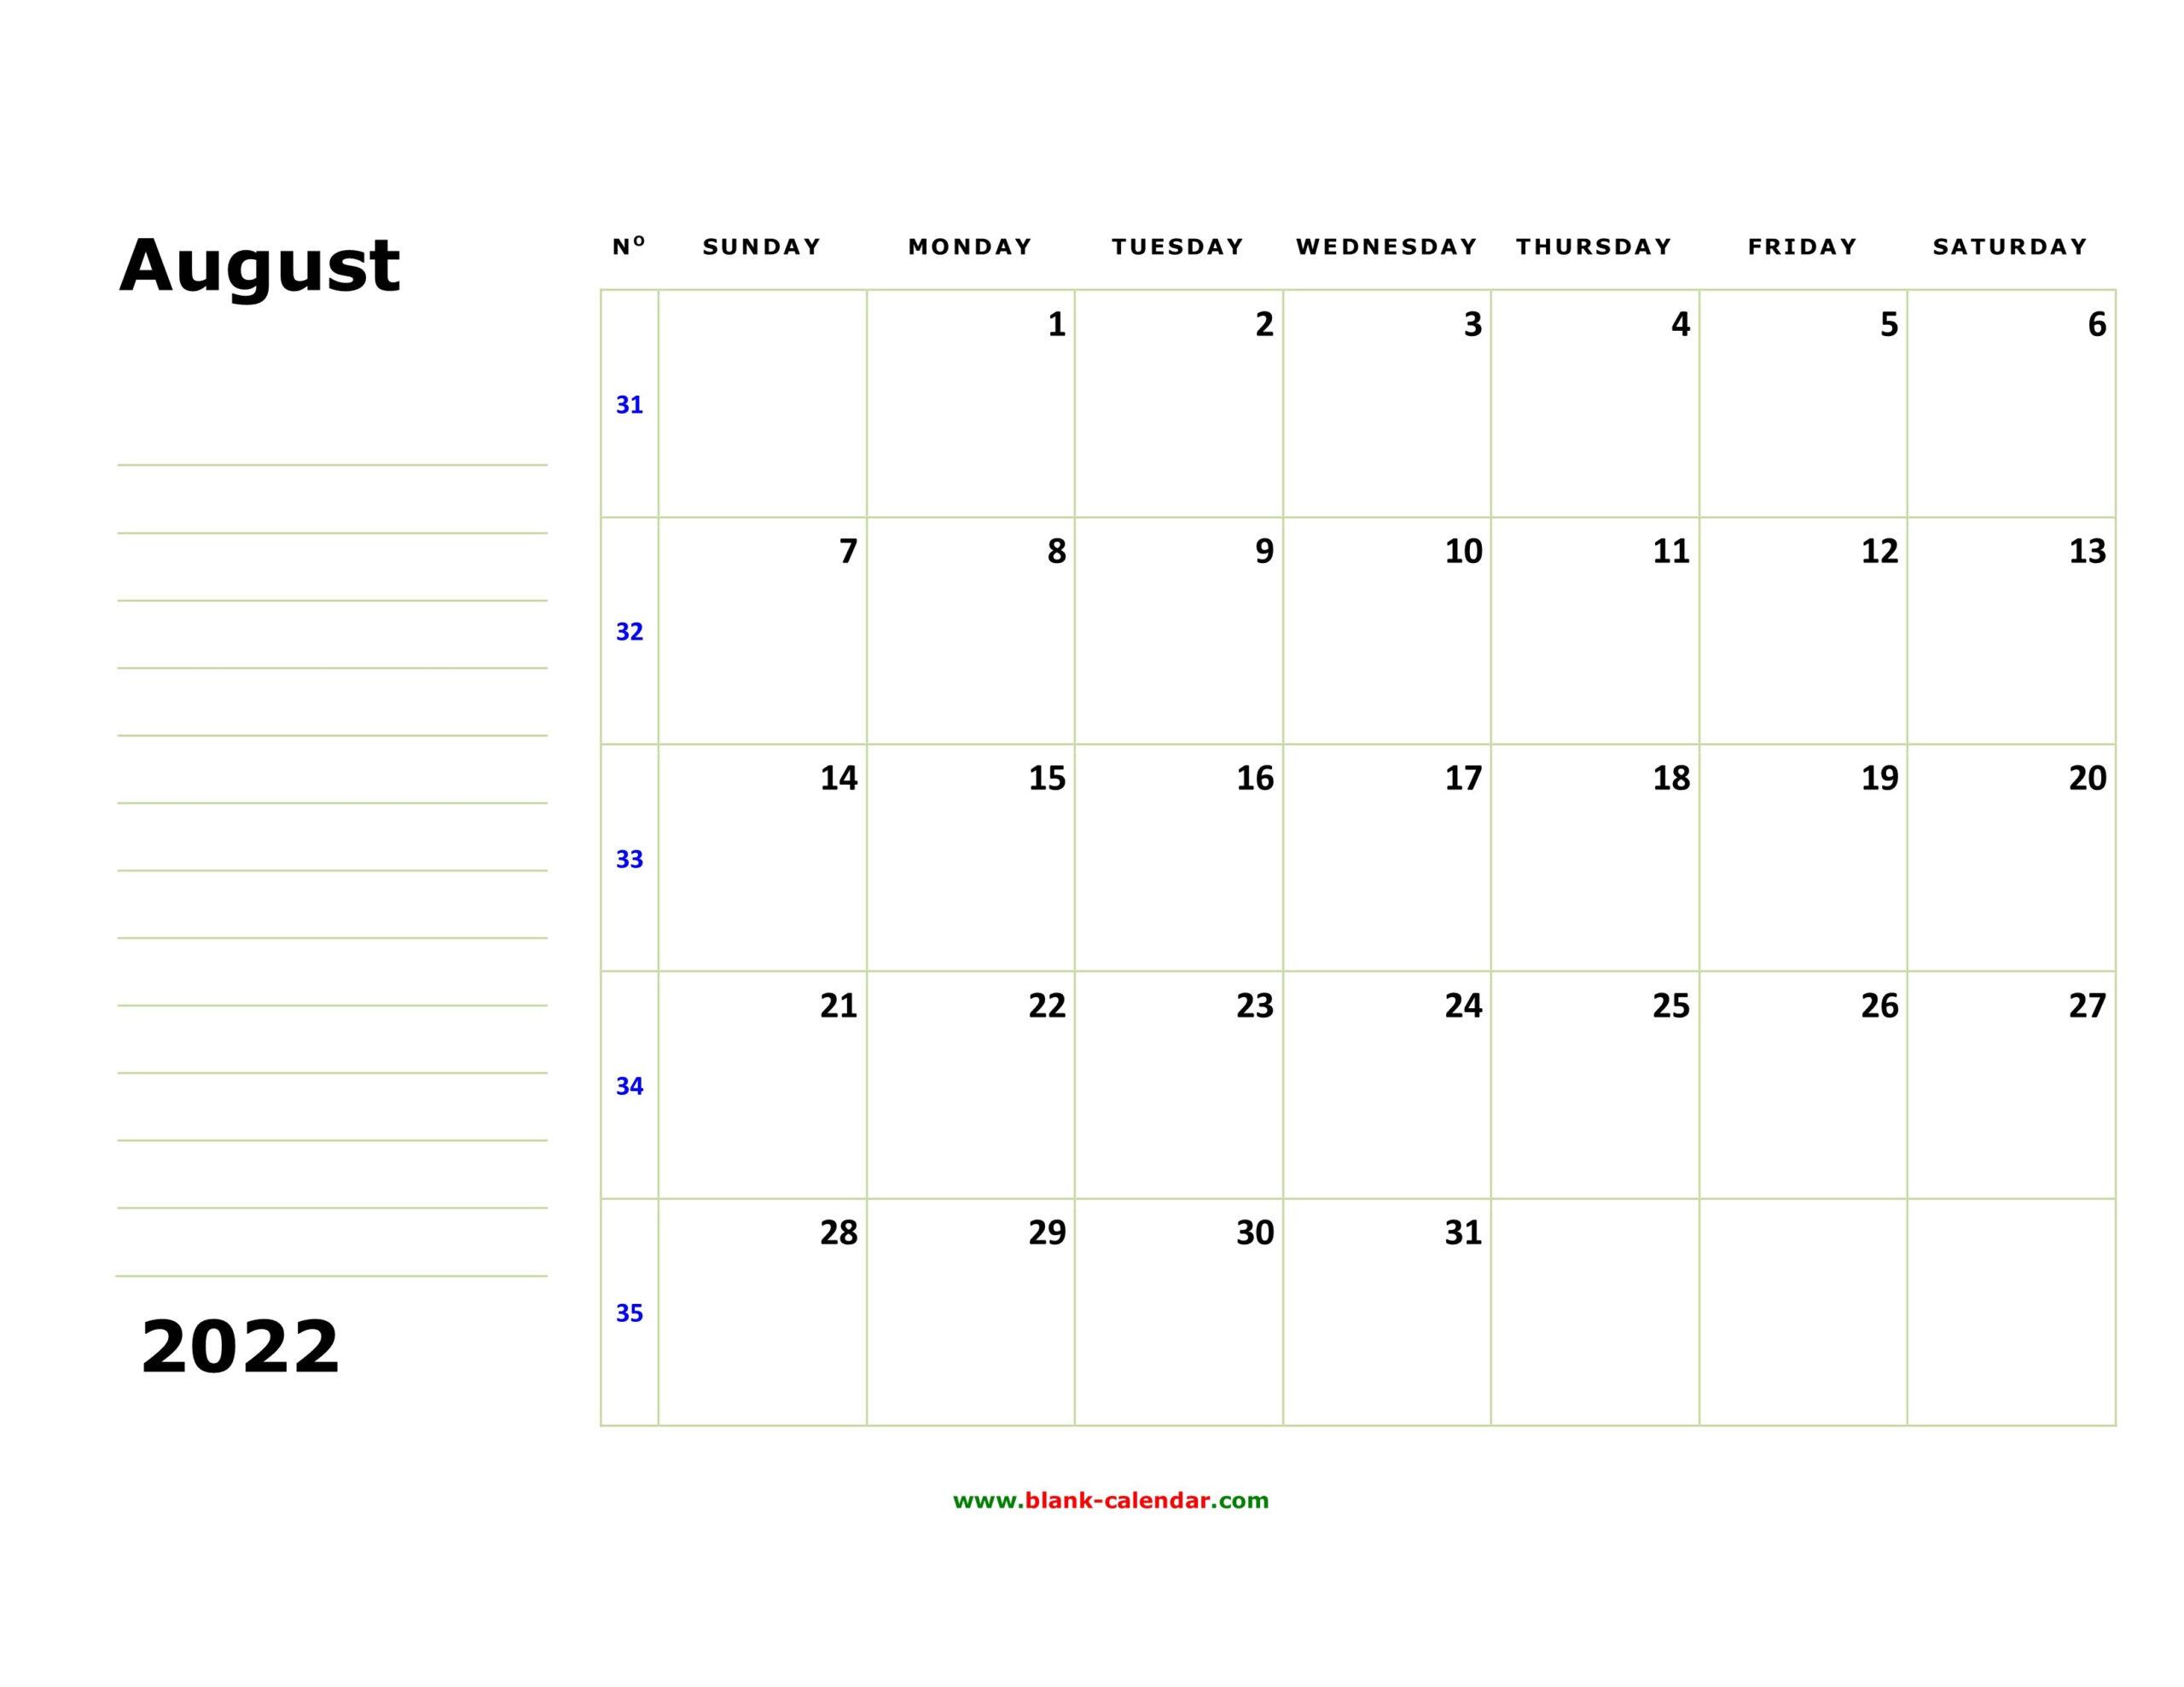 Free Download Printable August 2022 Calendar, Large Box regarding Printable Monthly Calendar August 2022